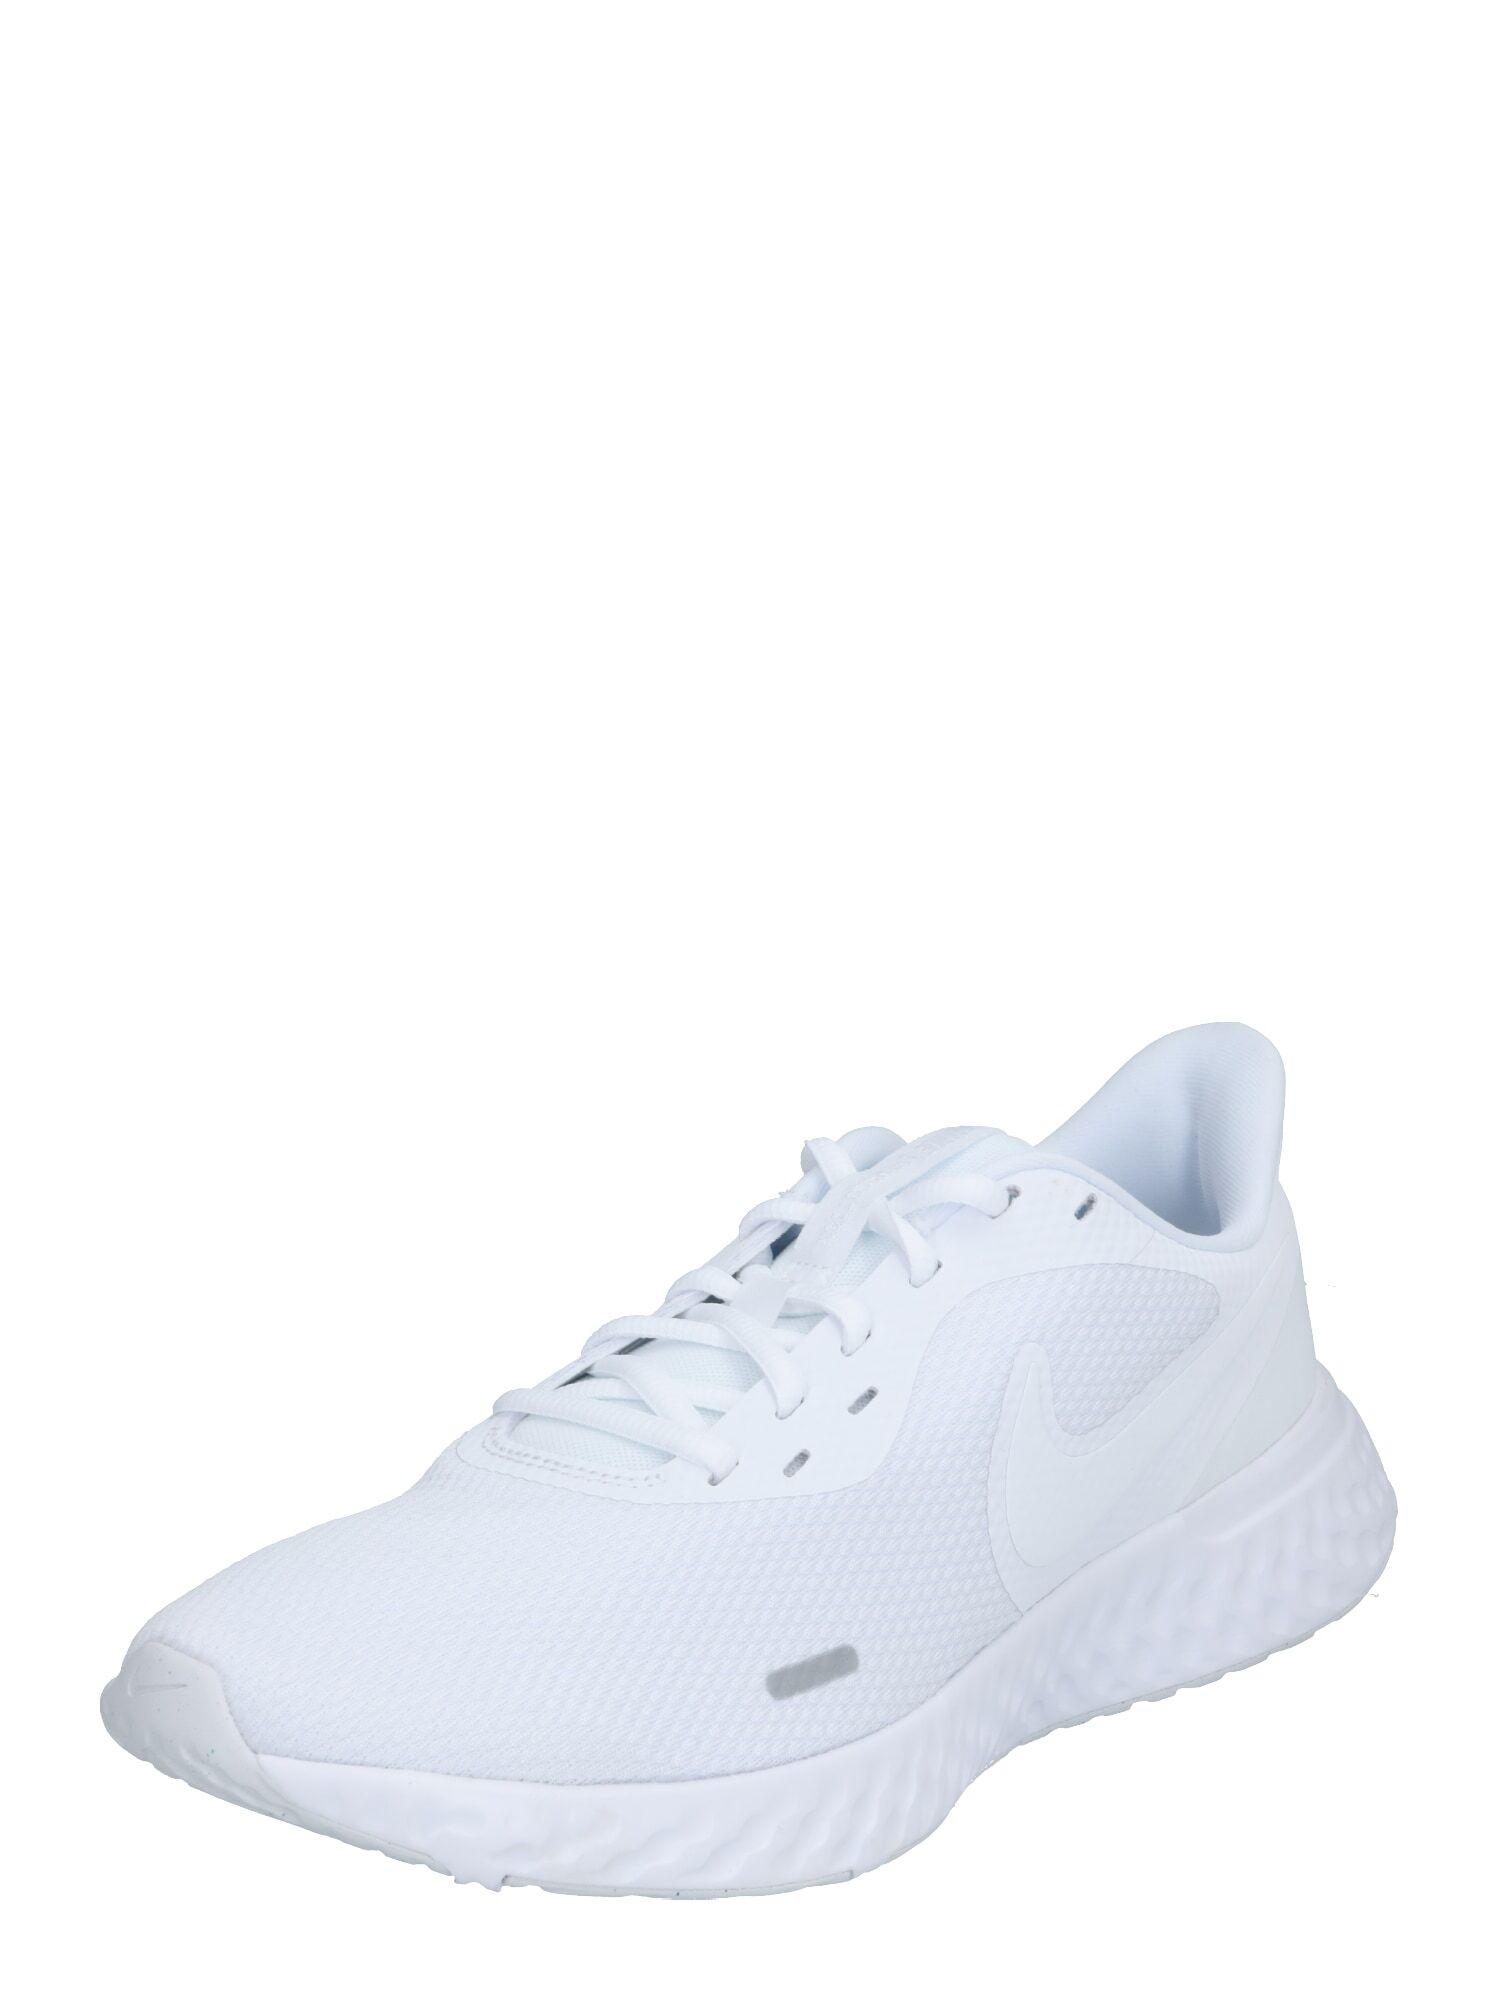 NIKE Chaussure de course 'Revolution 5'  - Blanc - Taille: 8.5 - male